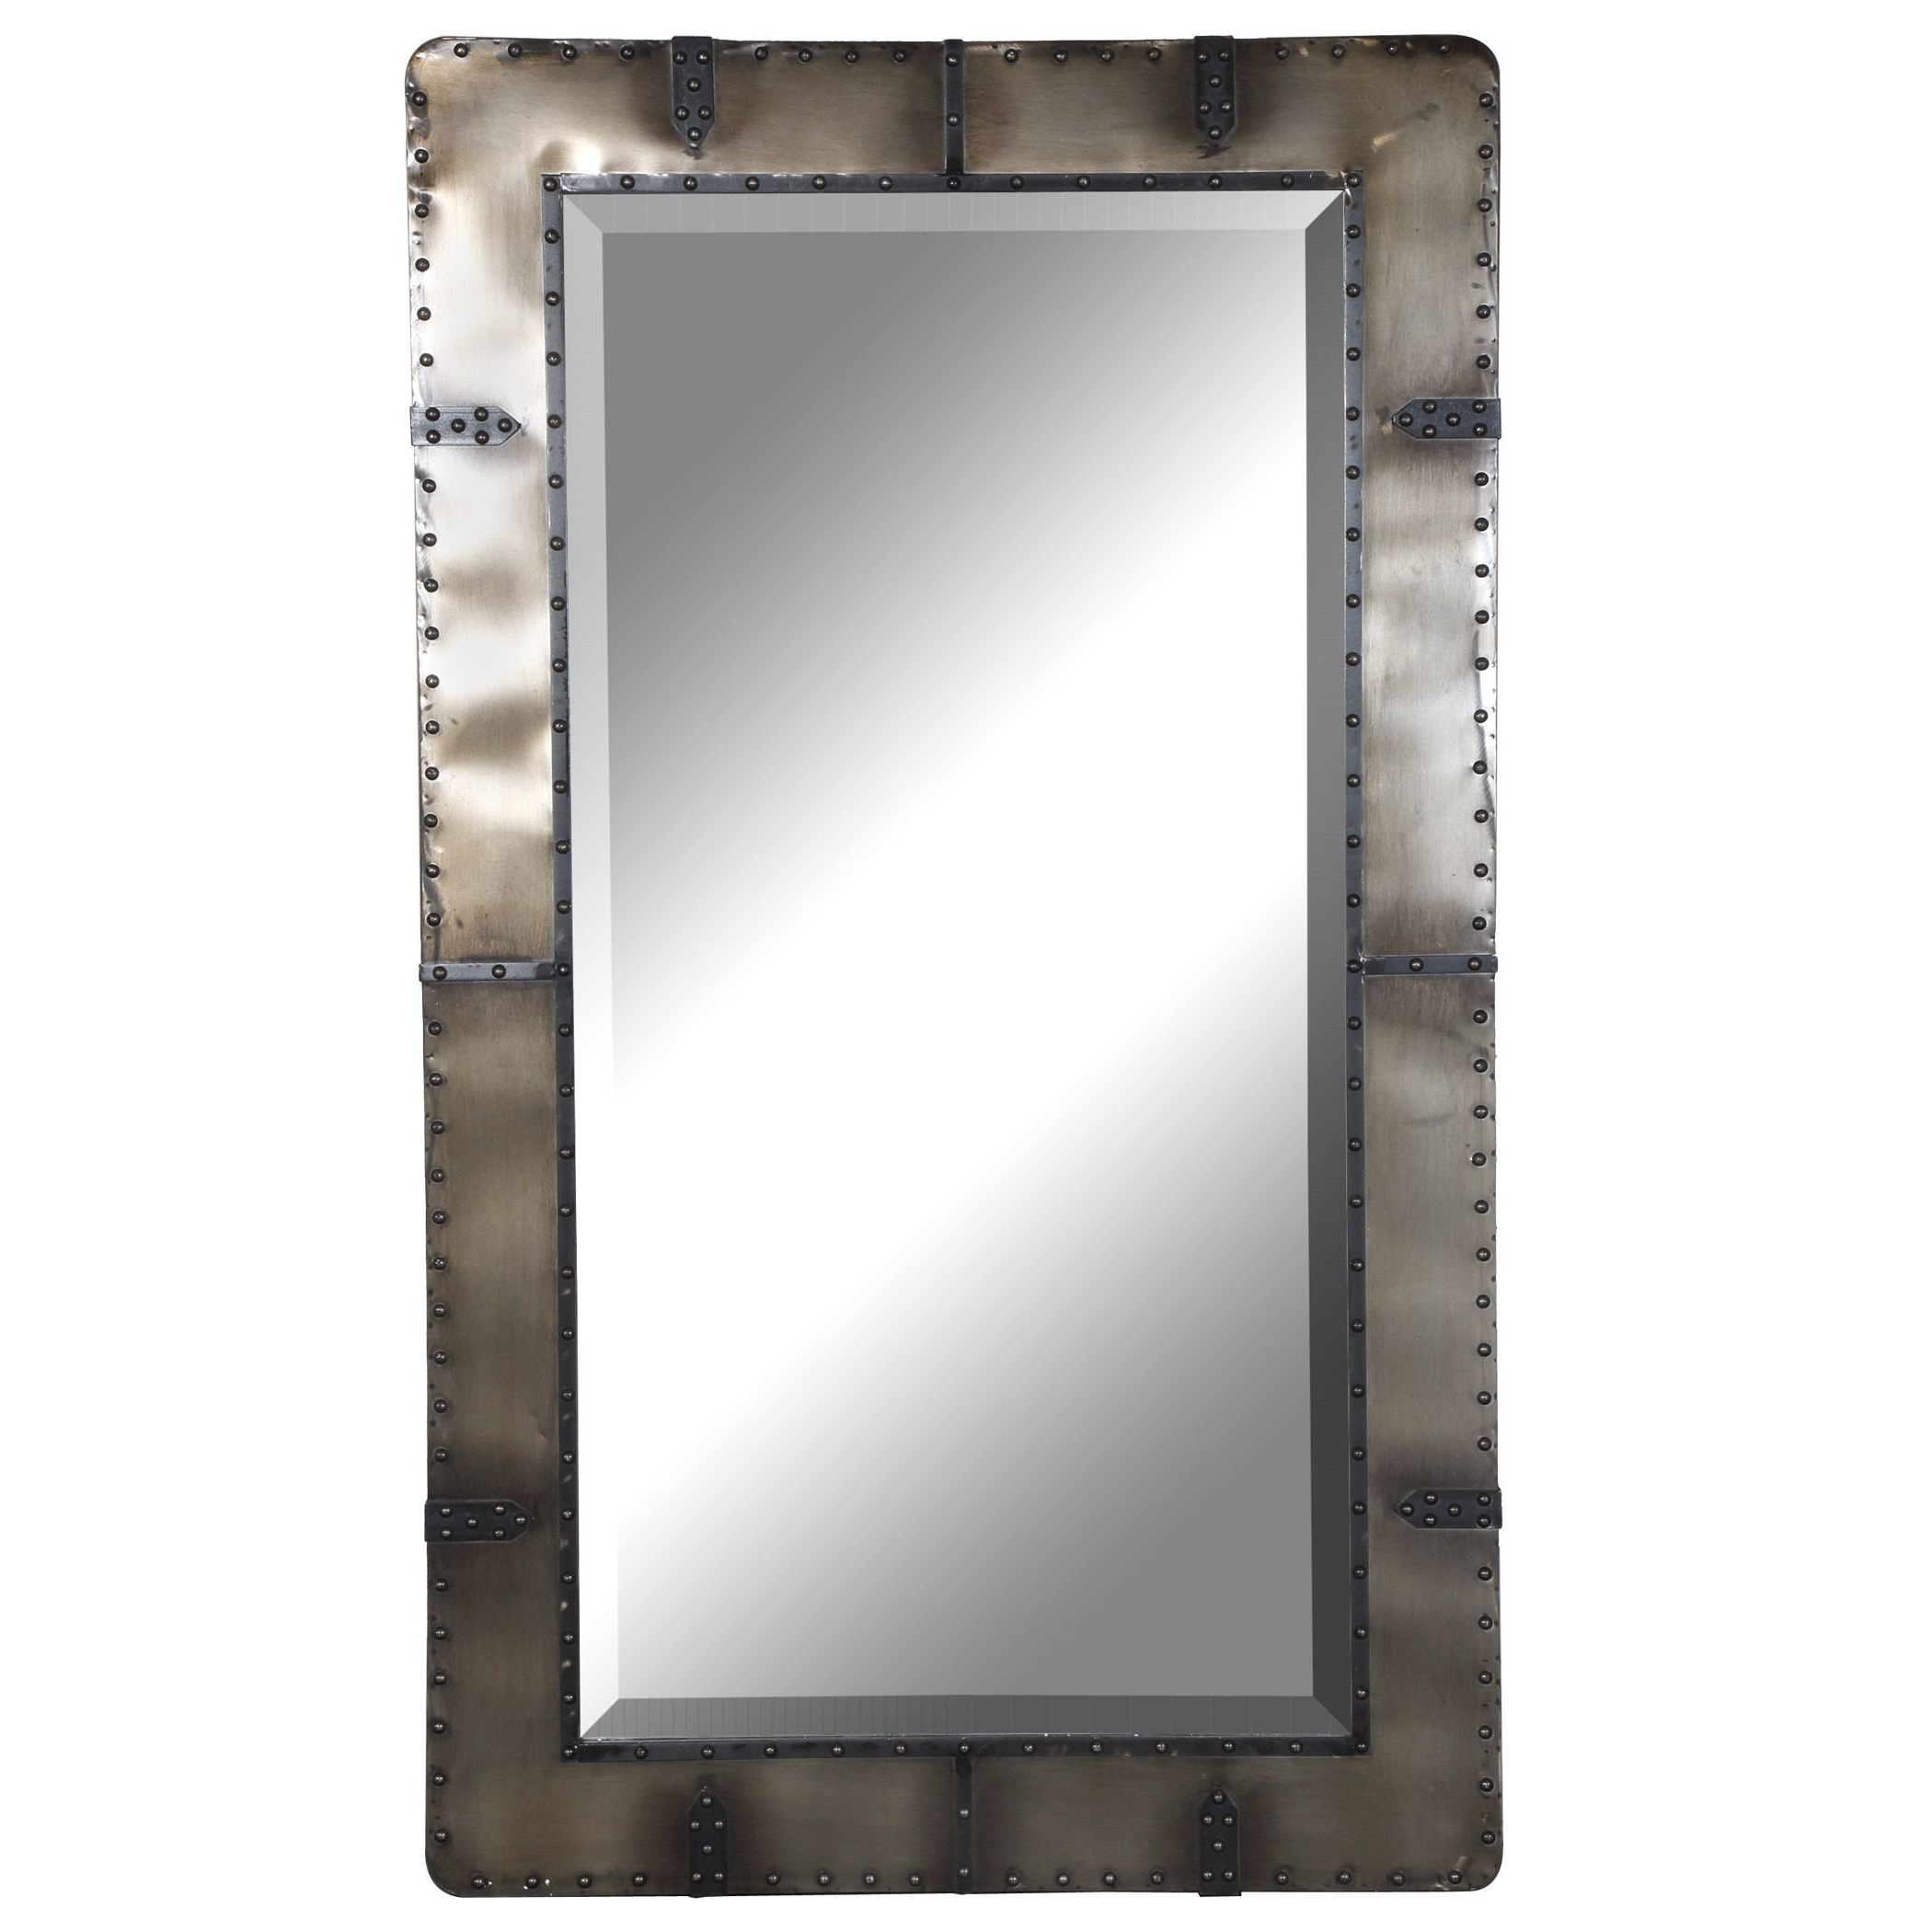 Reba Accent Wall Mirrors Throughout Preferred Williston Forge Reba Pettigrew Accent Mirror (View 3 of 20)